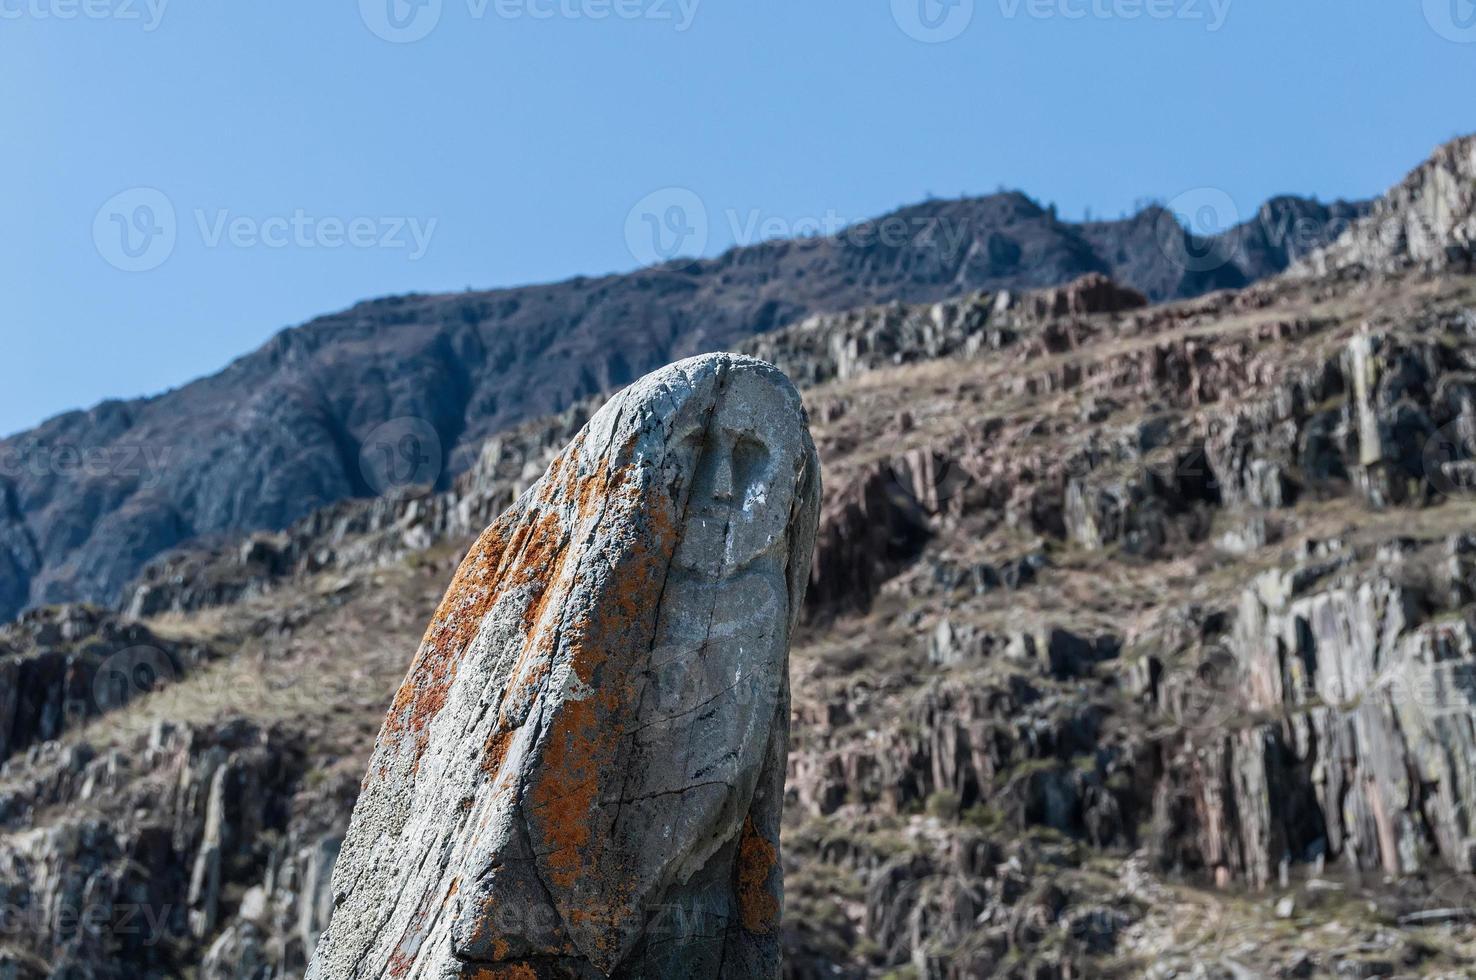 montanha de pedra de rena antiga foto